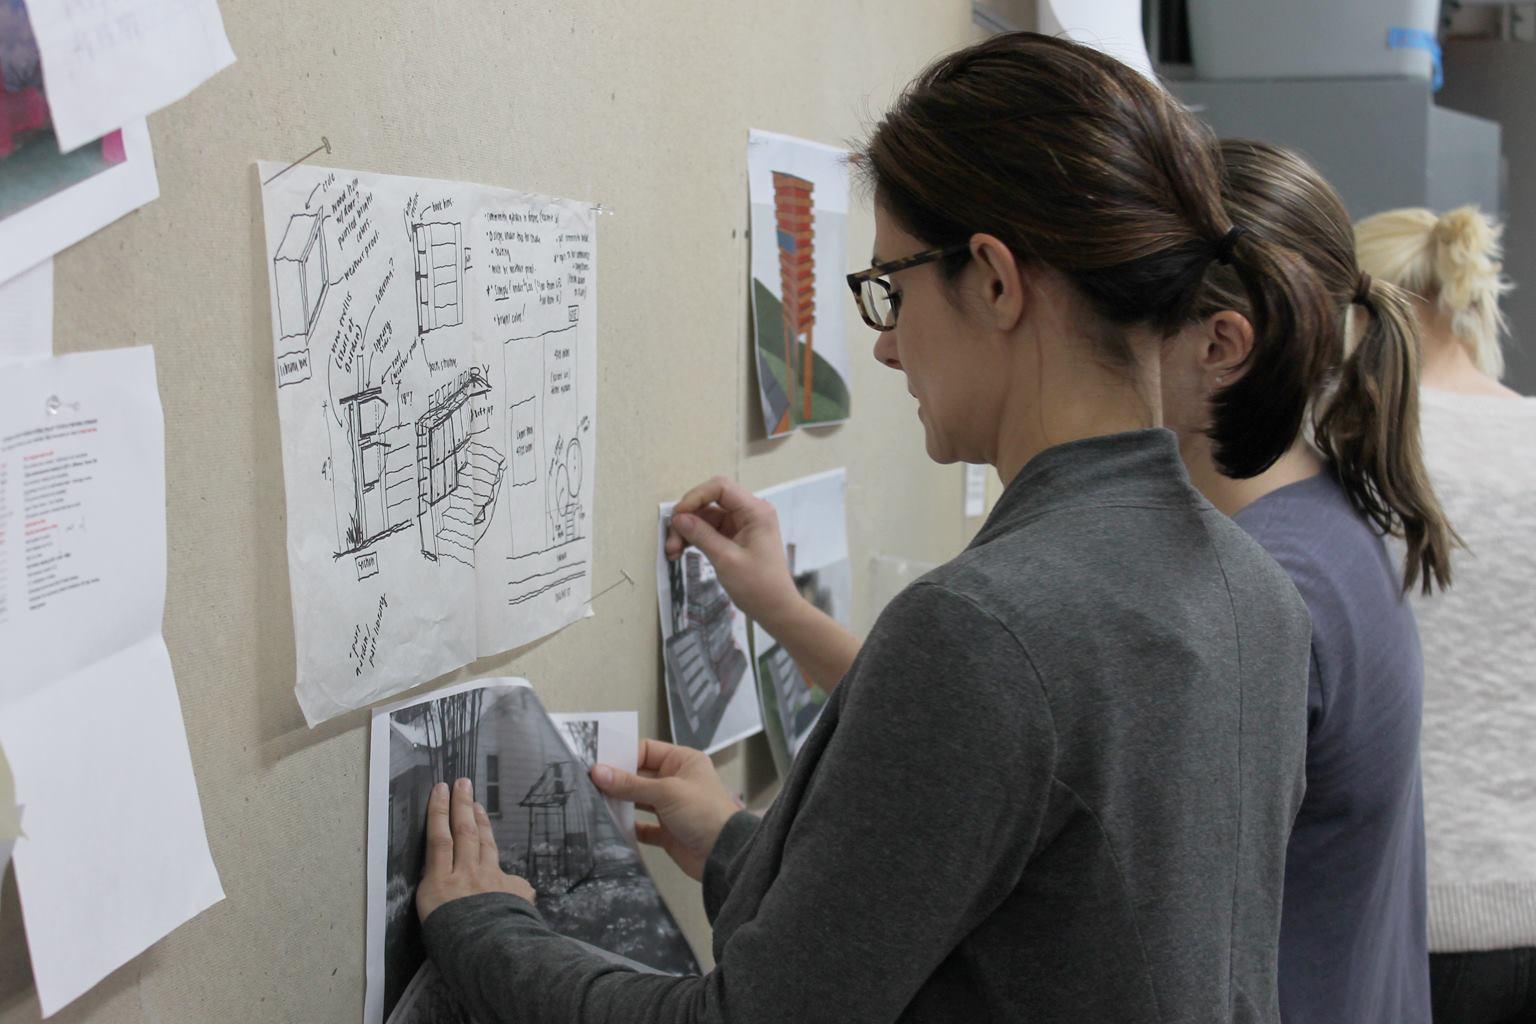 Studio Outside team members Allison Baker, Jessica Pfeffer, and Amanda Frey pin up inital sketches at a designer charette hosted by bcWorkshop. Image by bcWorkshop.